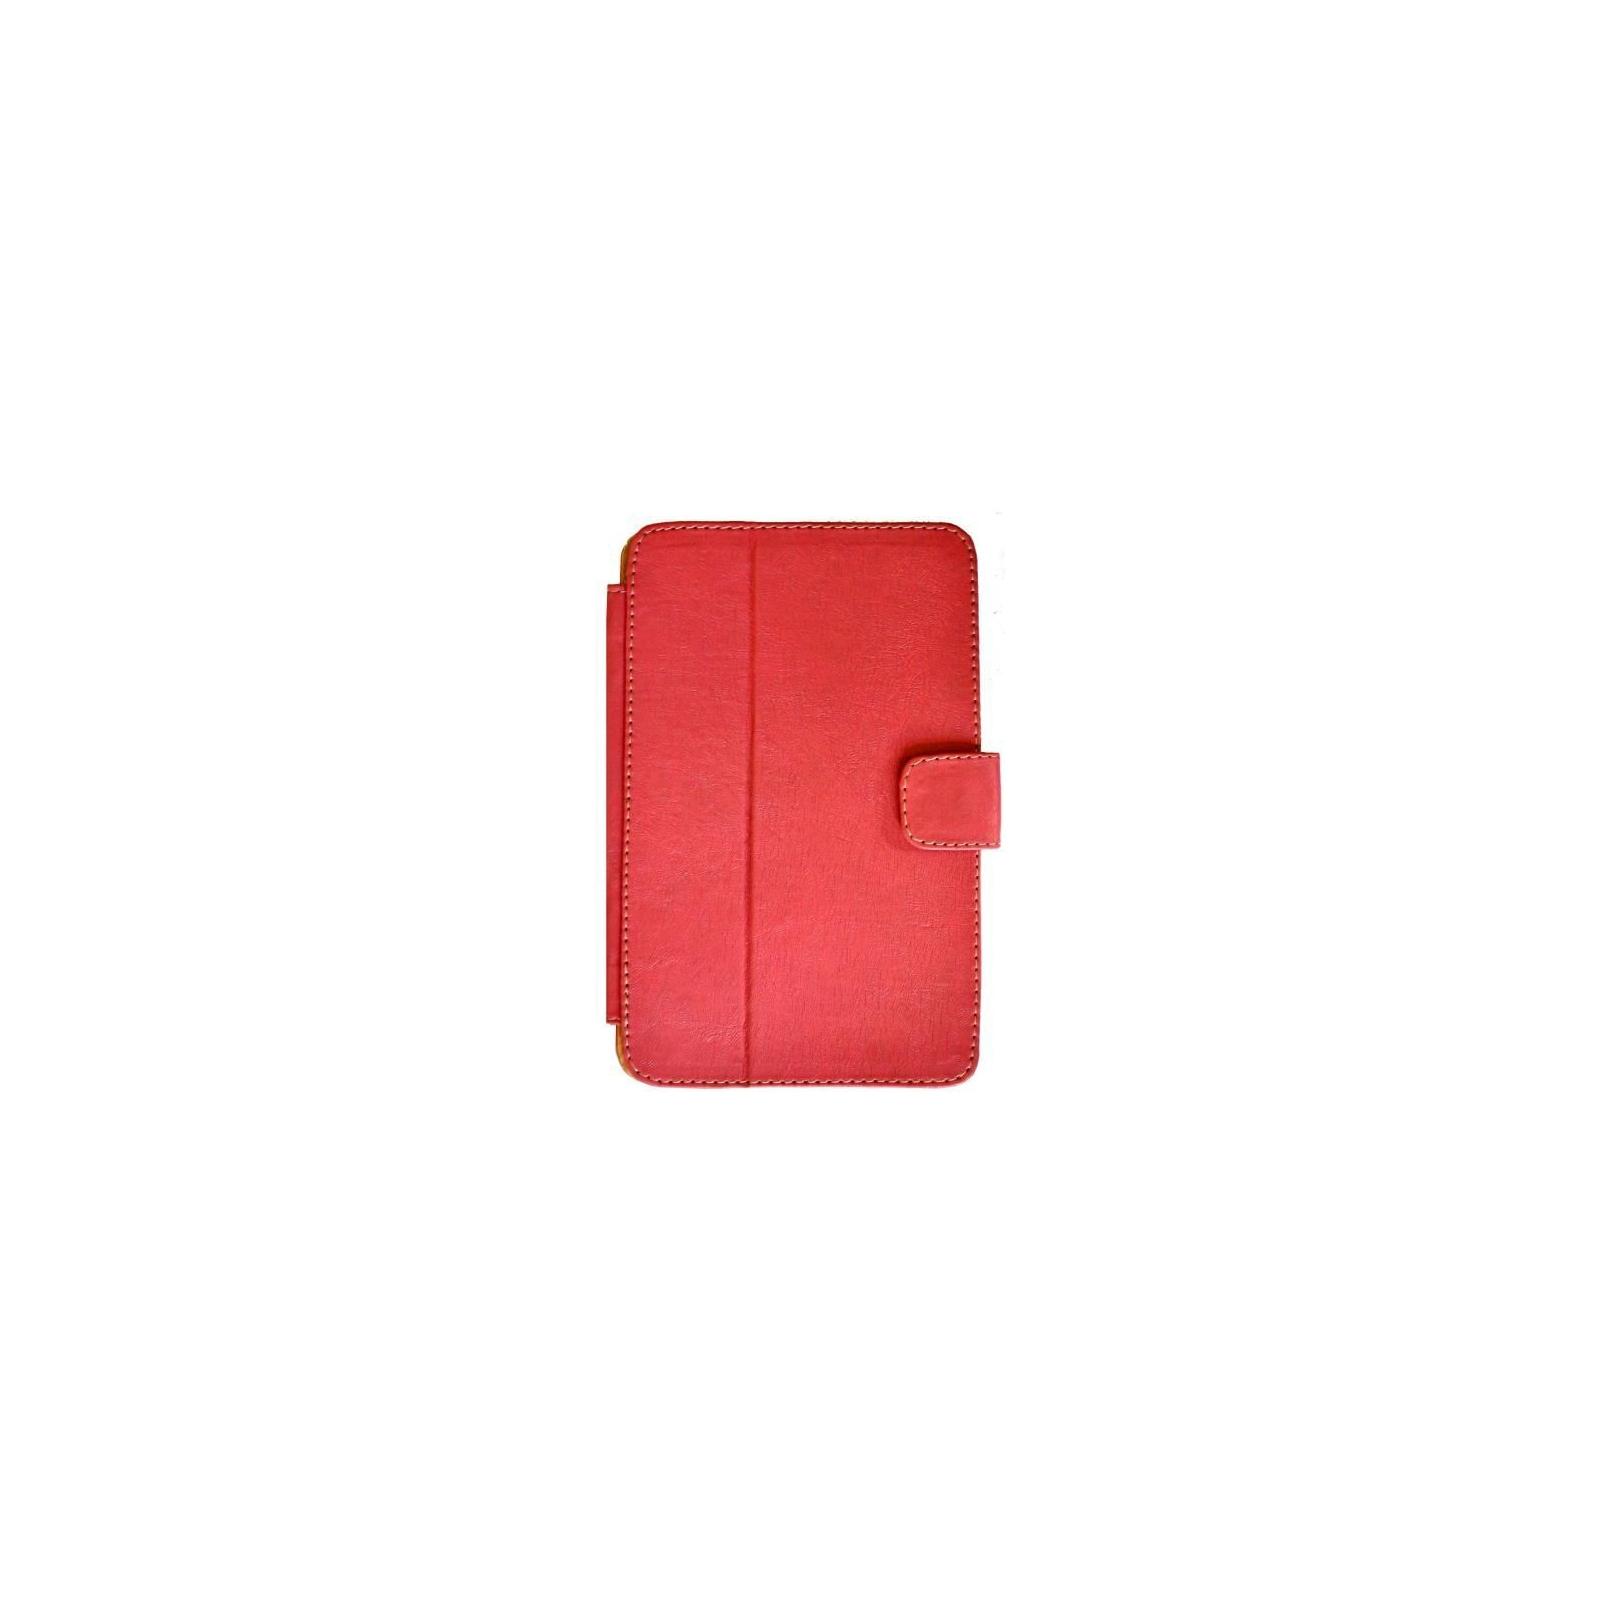 Чехол для планшета Vento 10.1 COOL - red